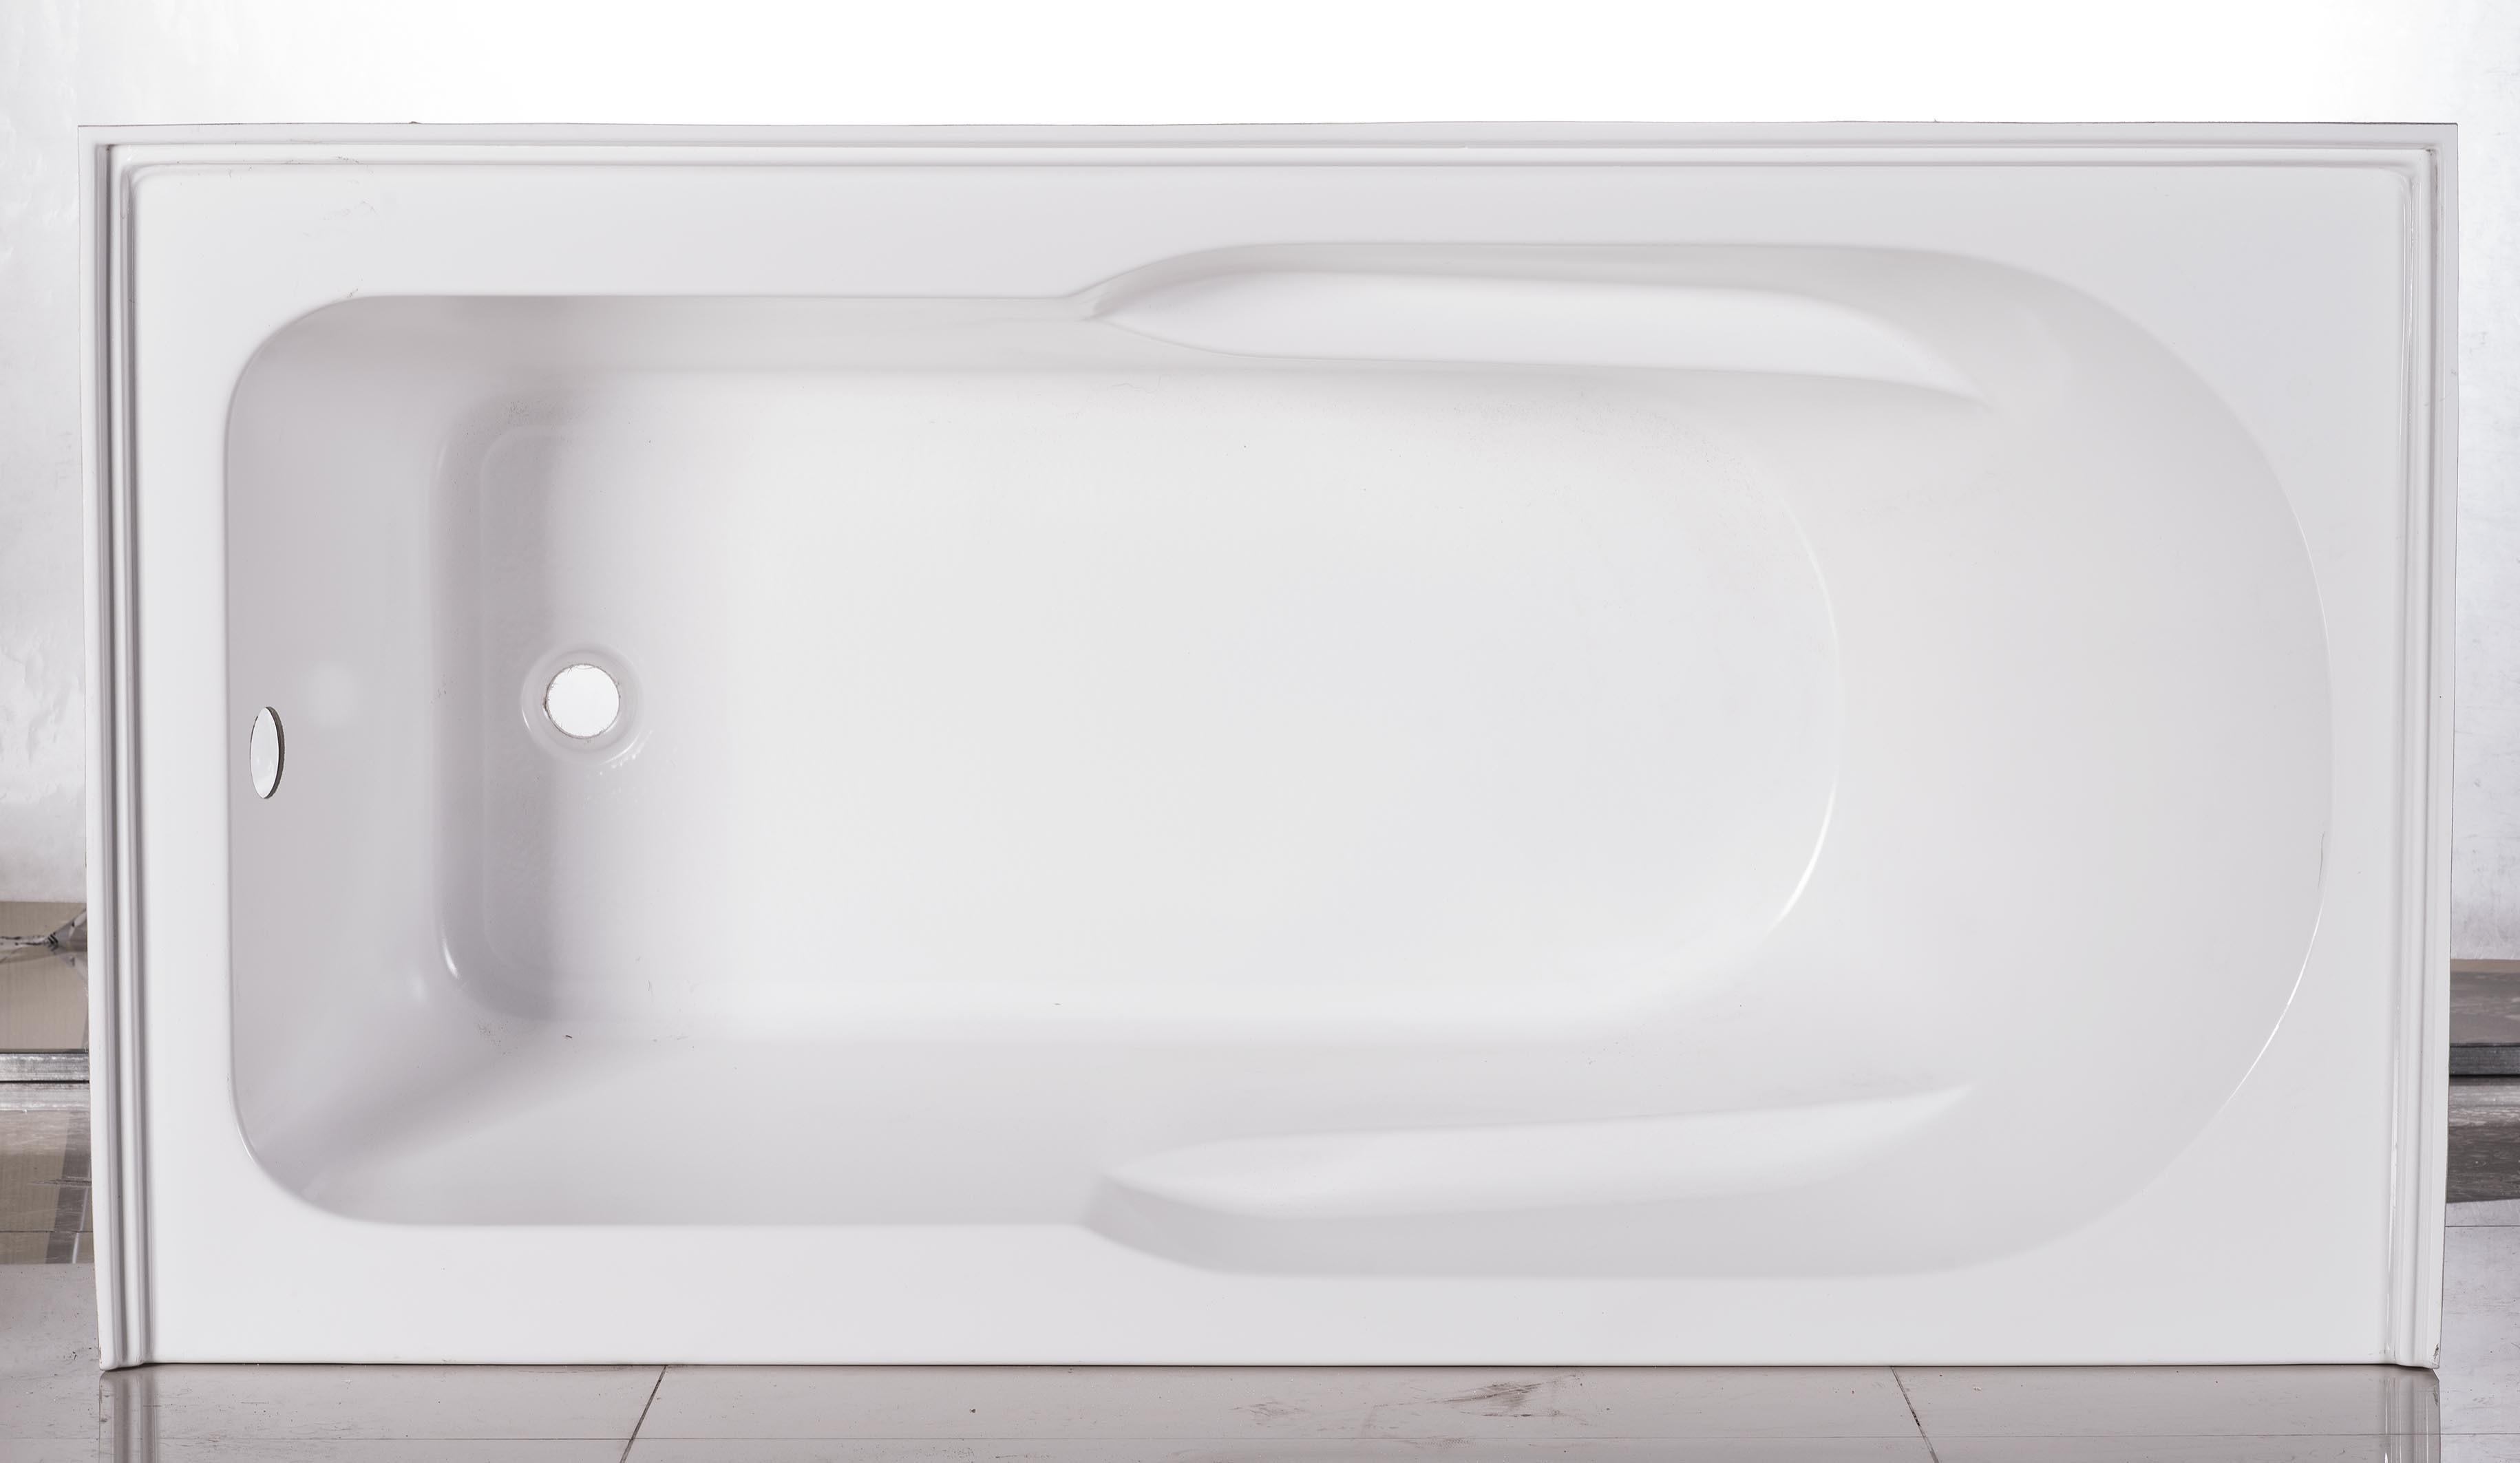 China American Standard Apron Bathtub Skirt Bath Tub Photos ...